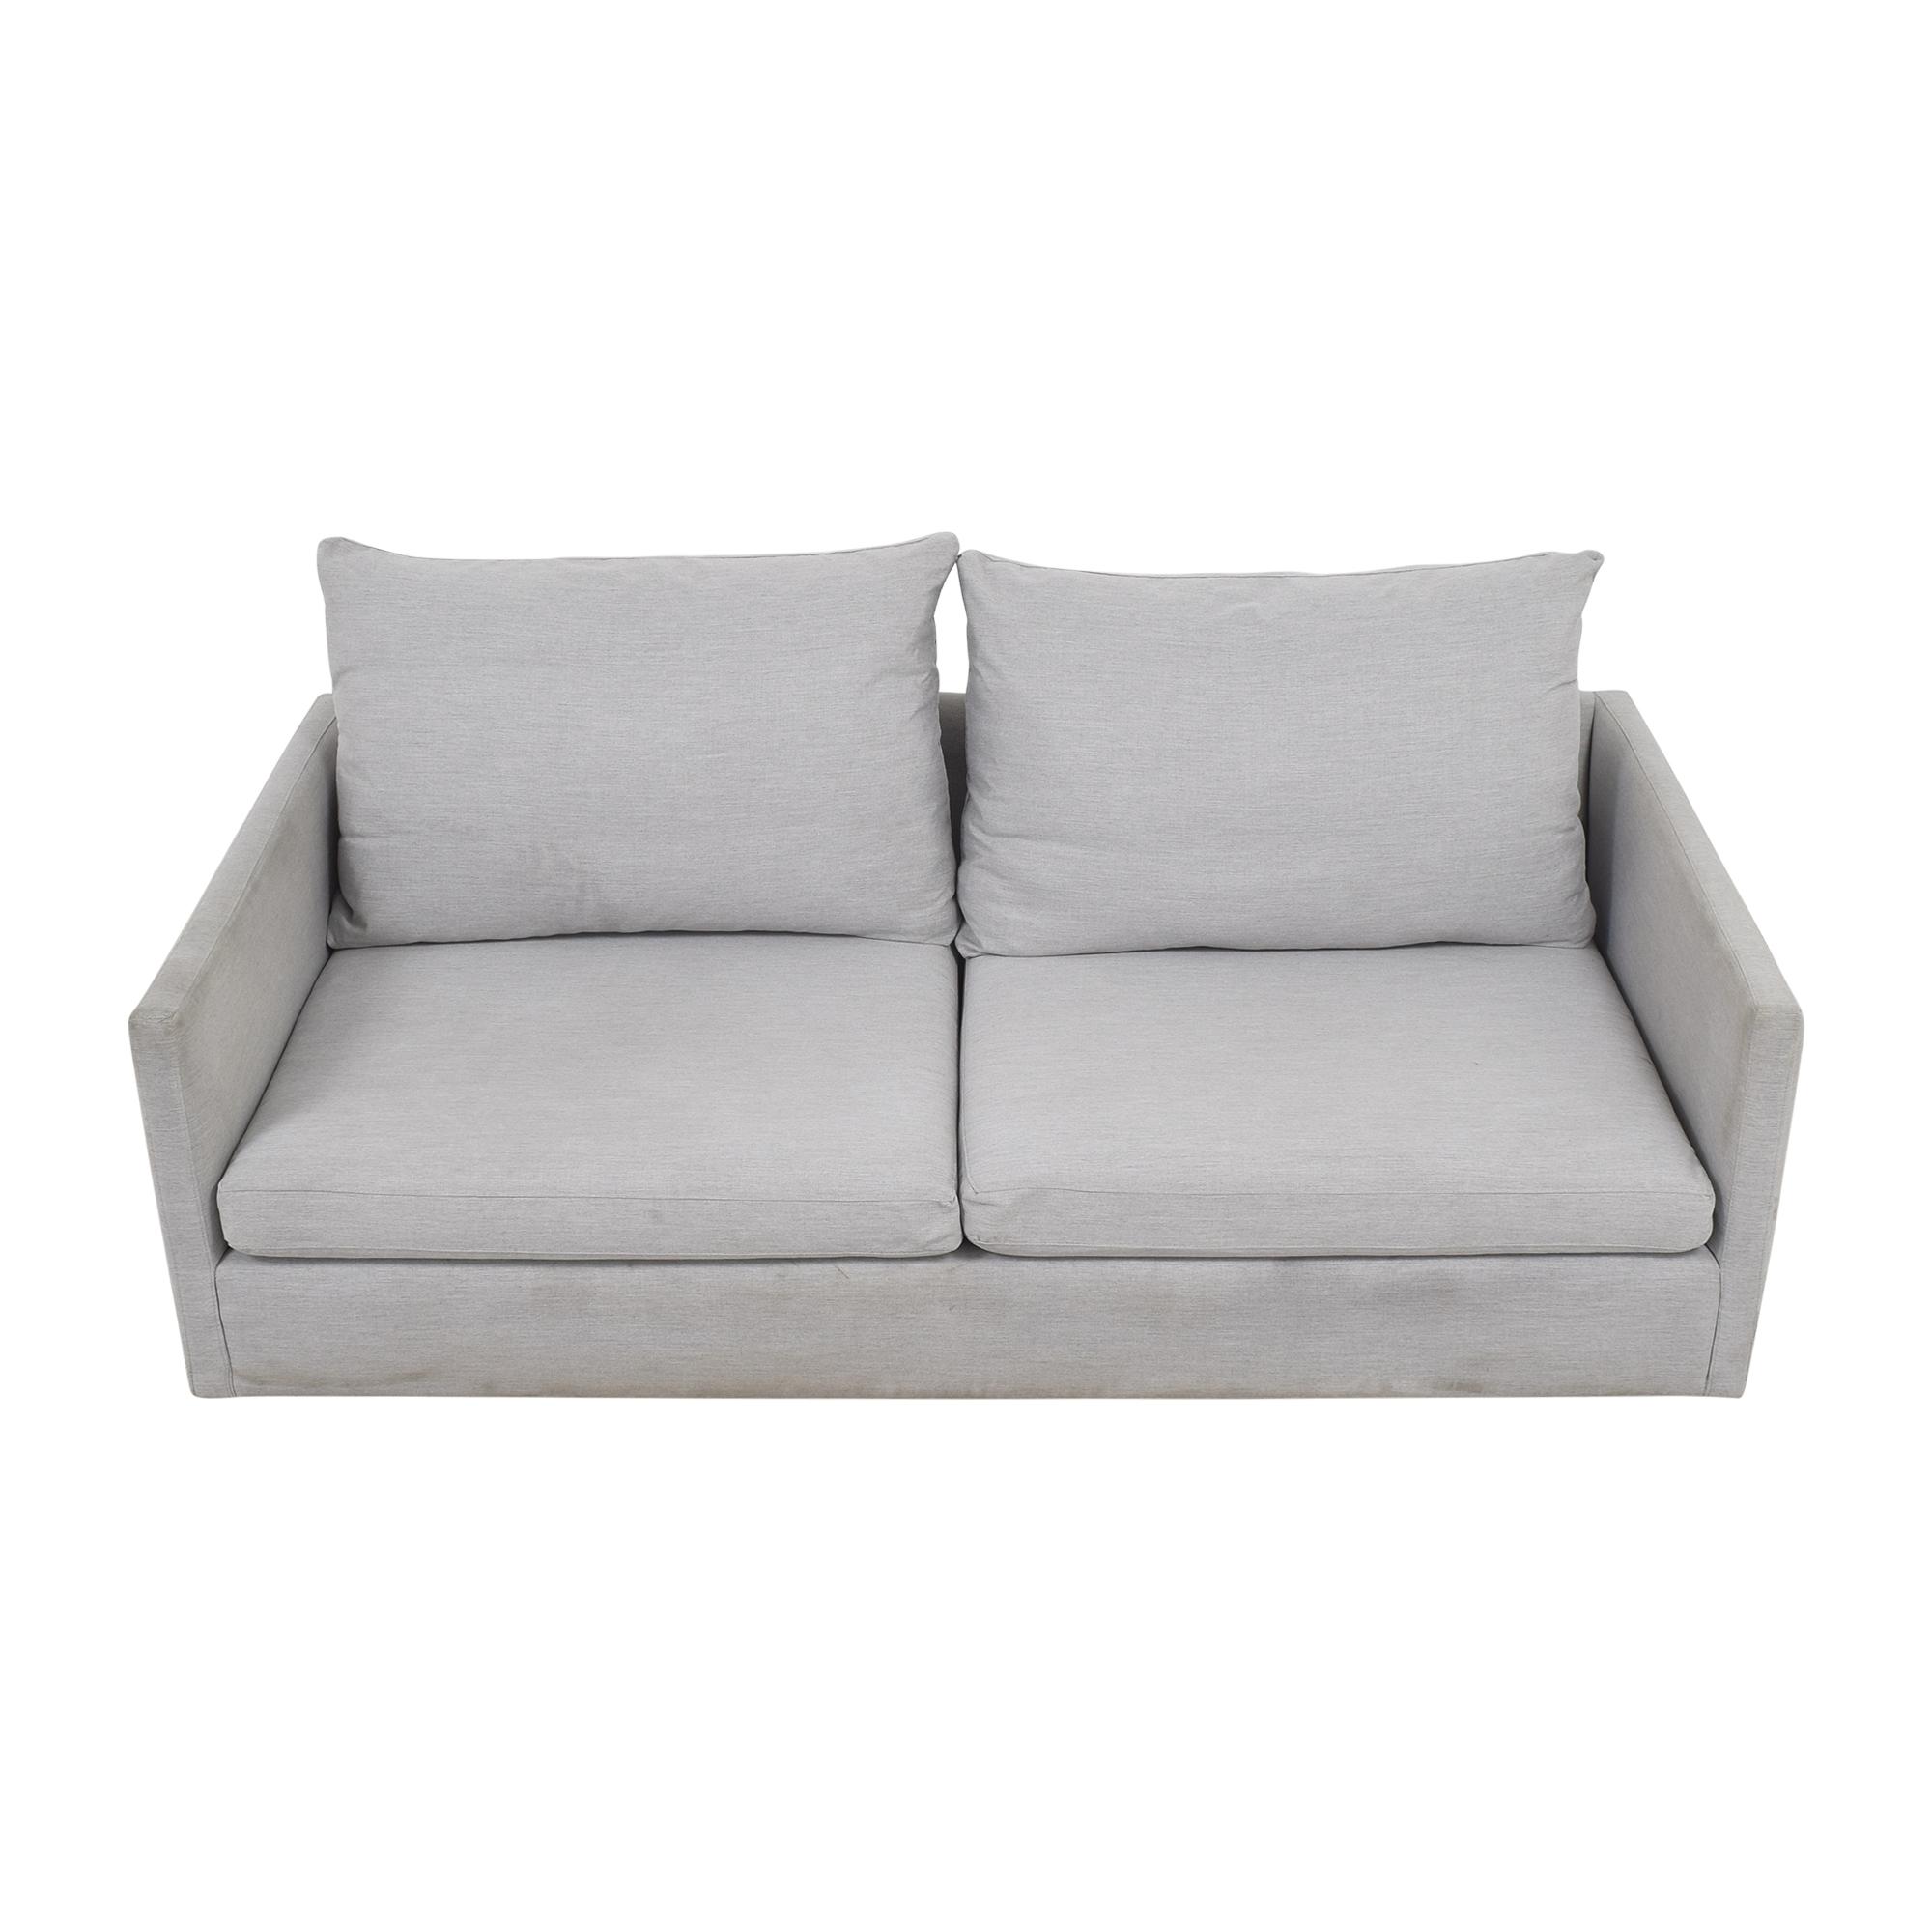 ABC Carpet & Home Two Cushion Sofa / Classic Sofas